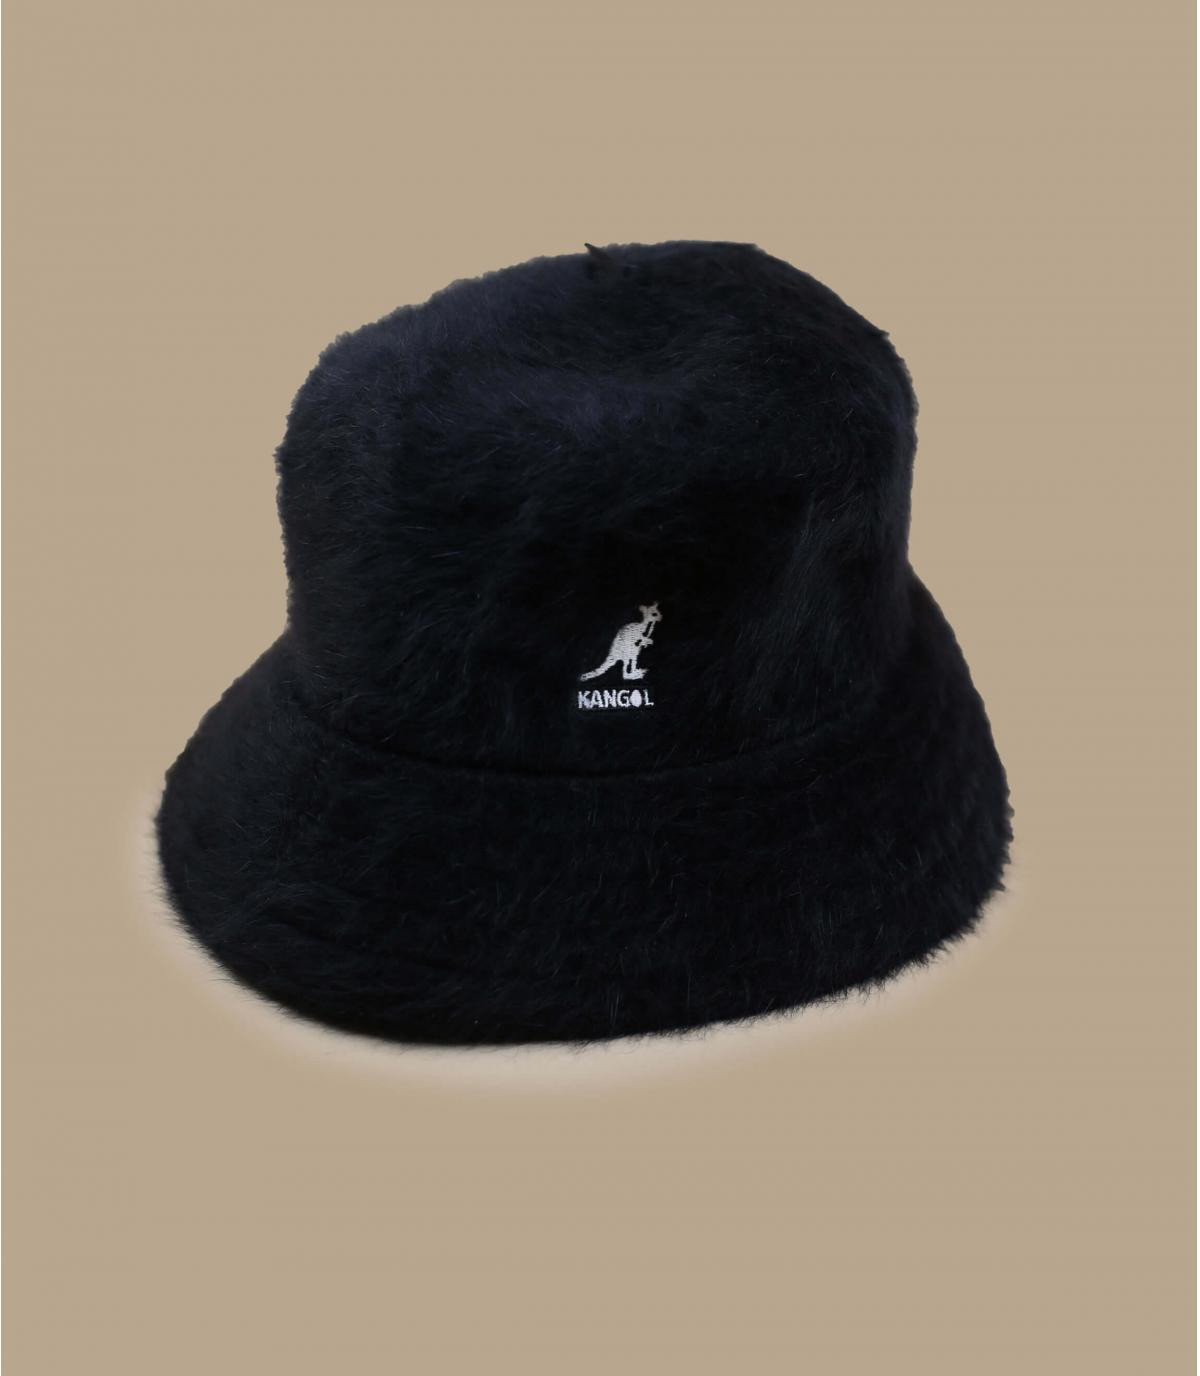 Details Furgora Bucket black - afbeeling 2